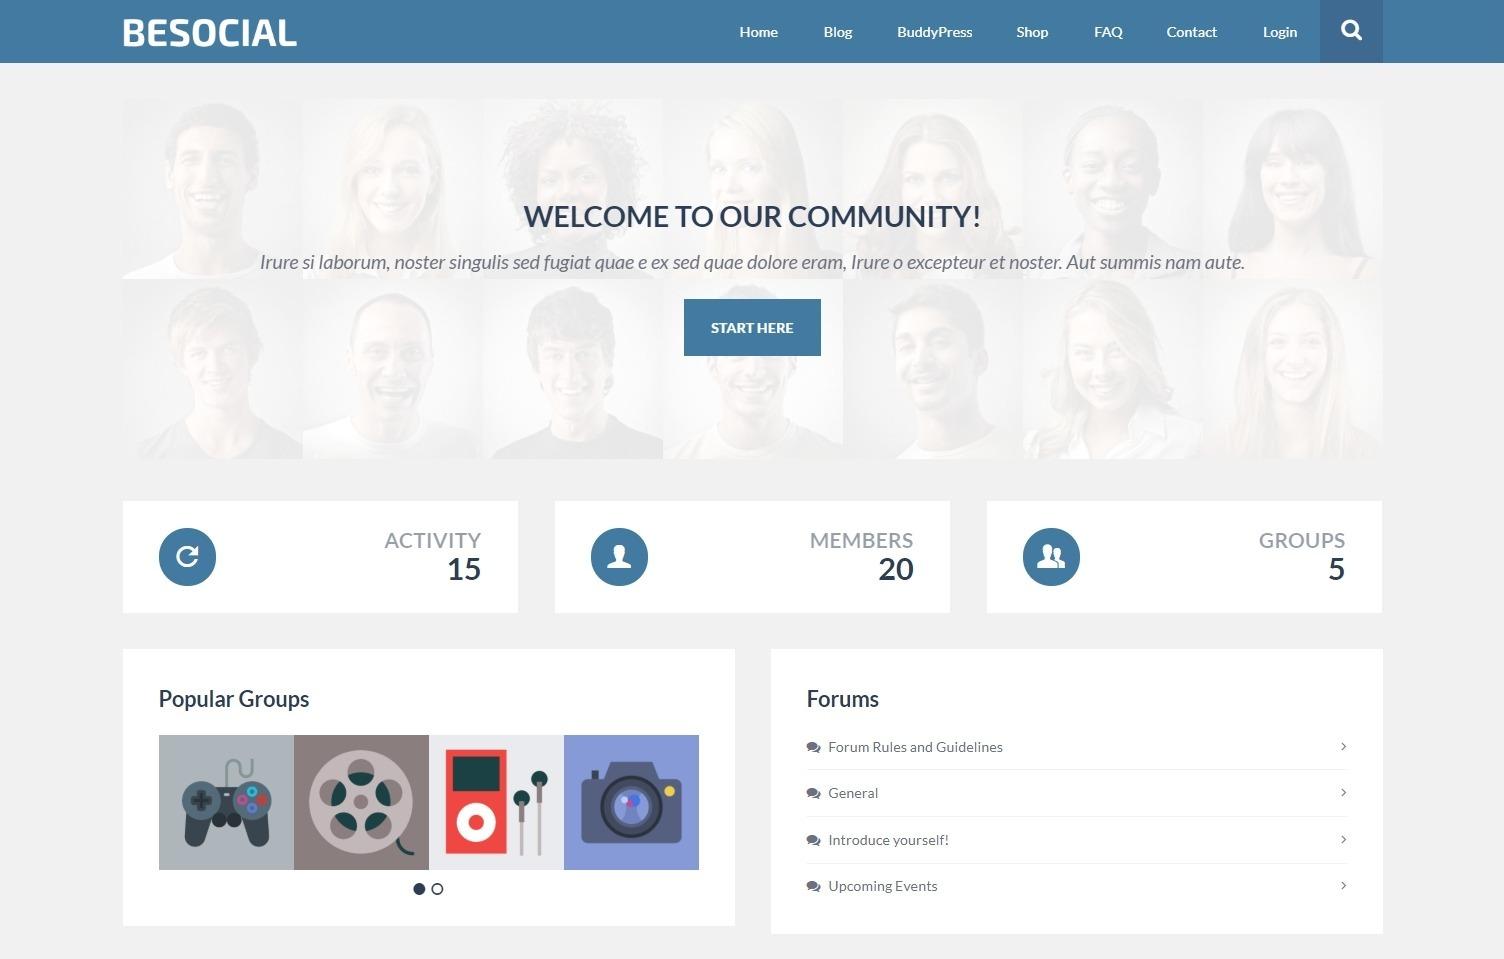 BeSocial BuddyPress Powered Dating Website